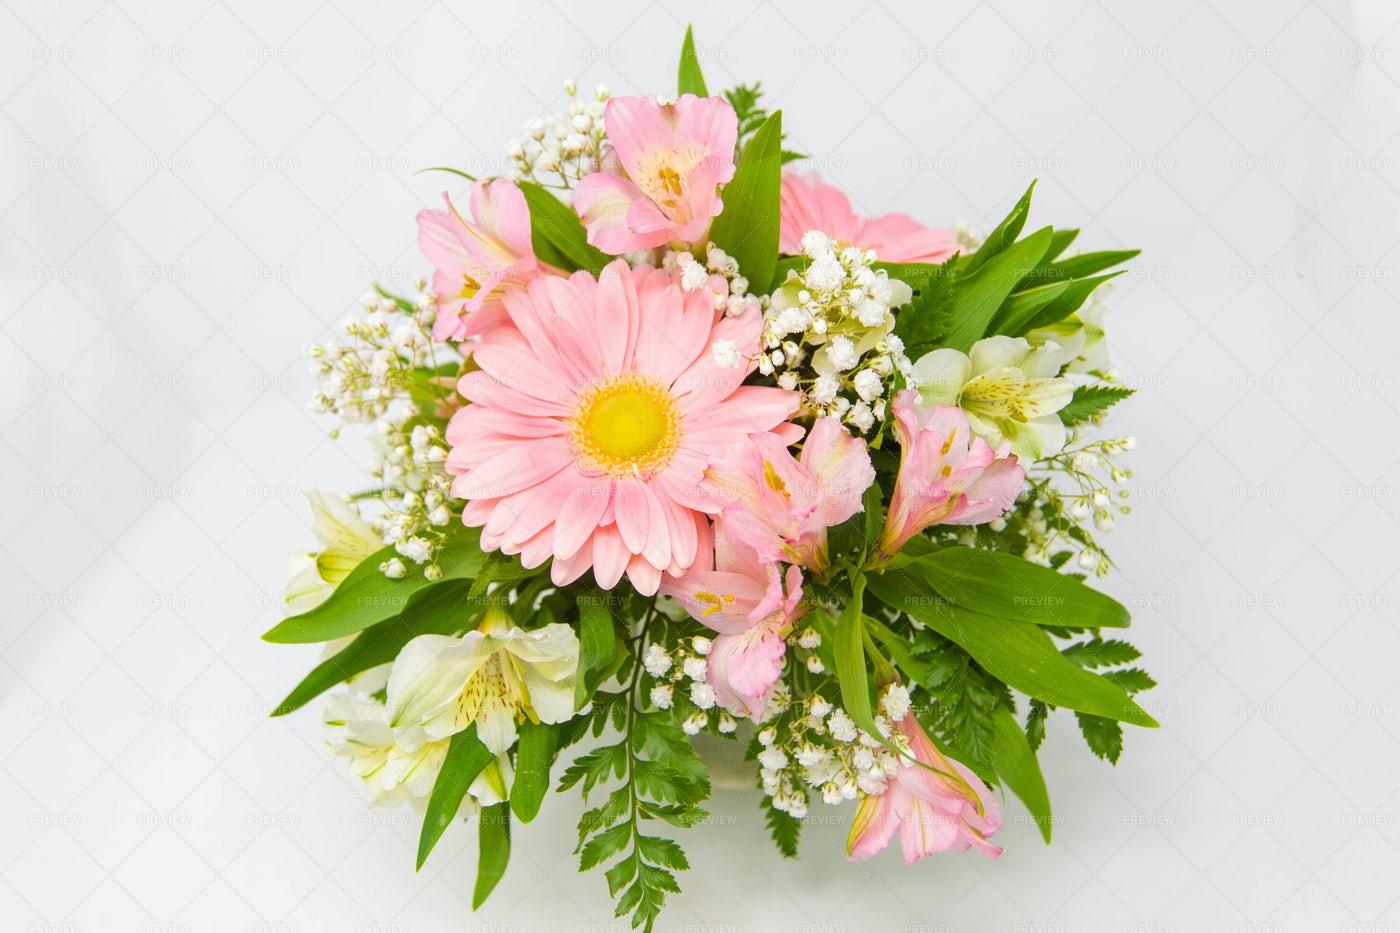 Pink Birthday Flowers: Stock Photos